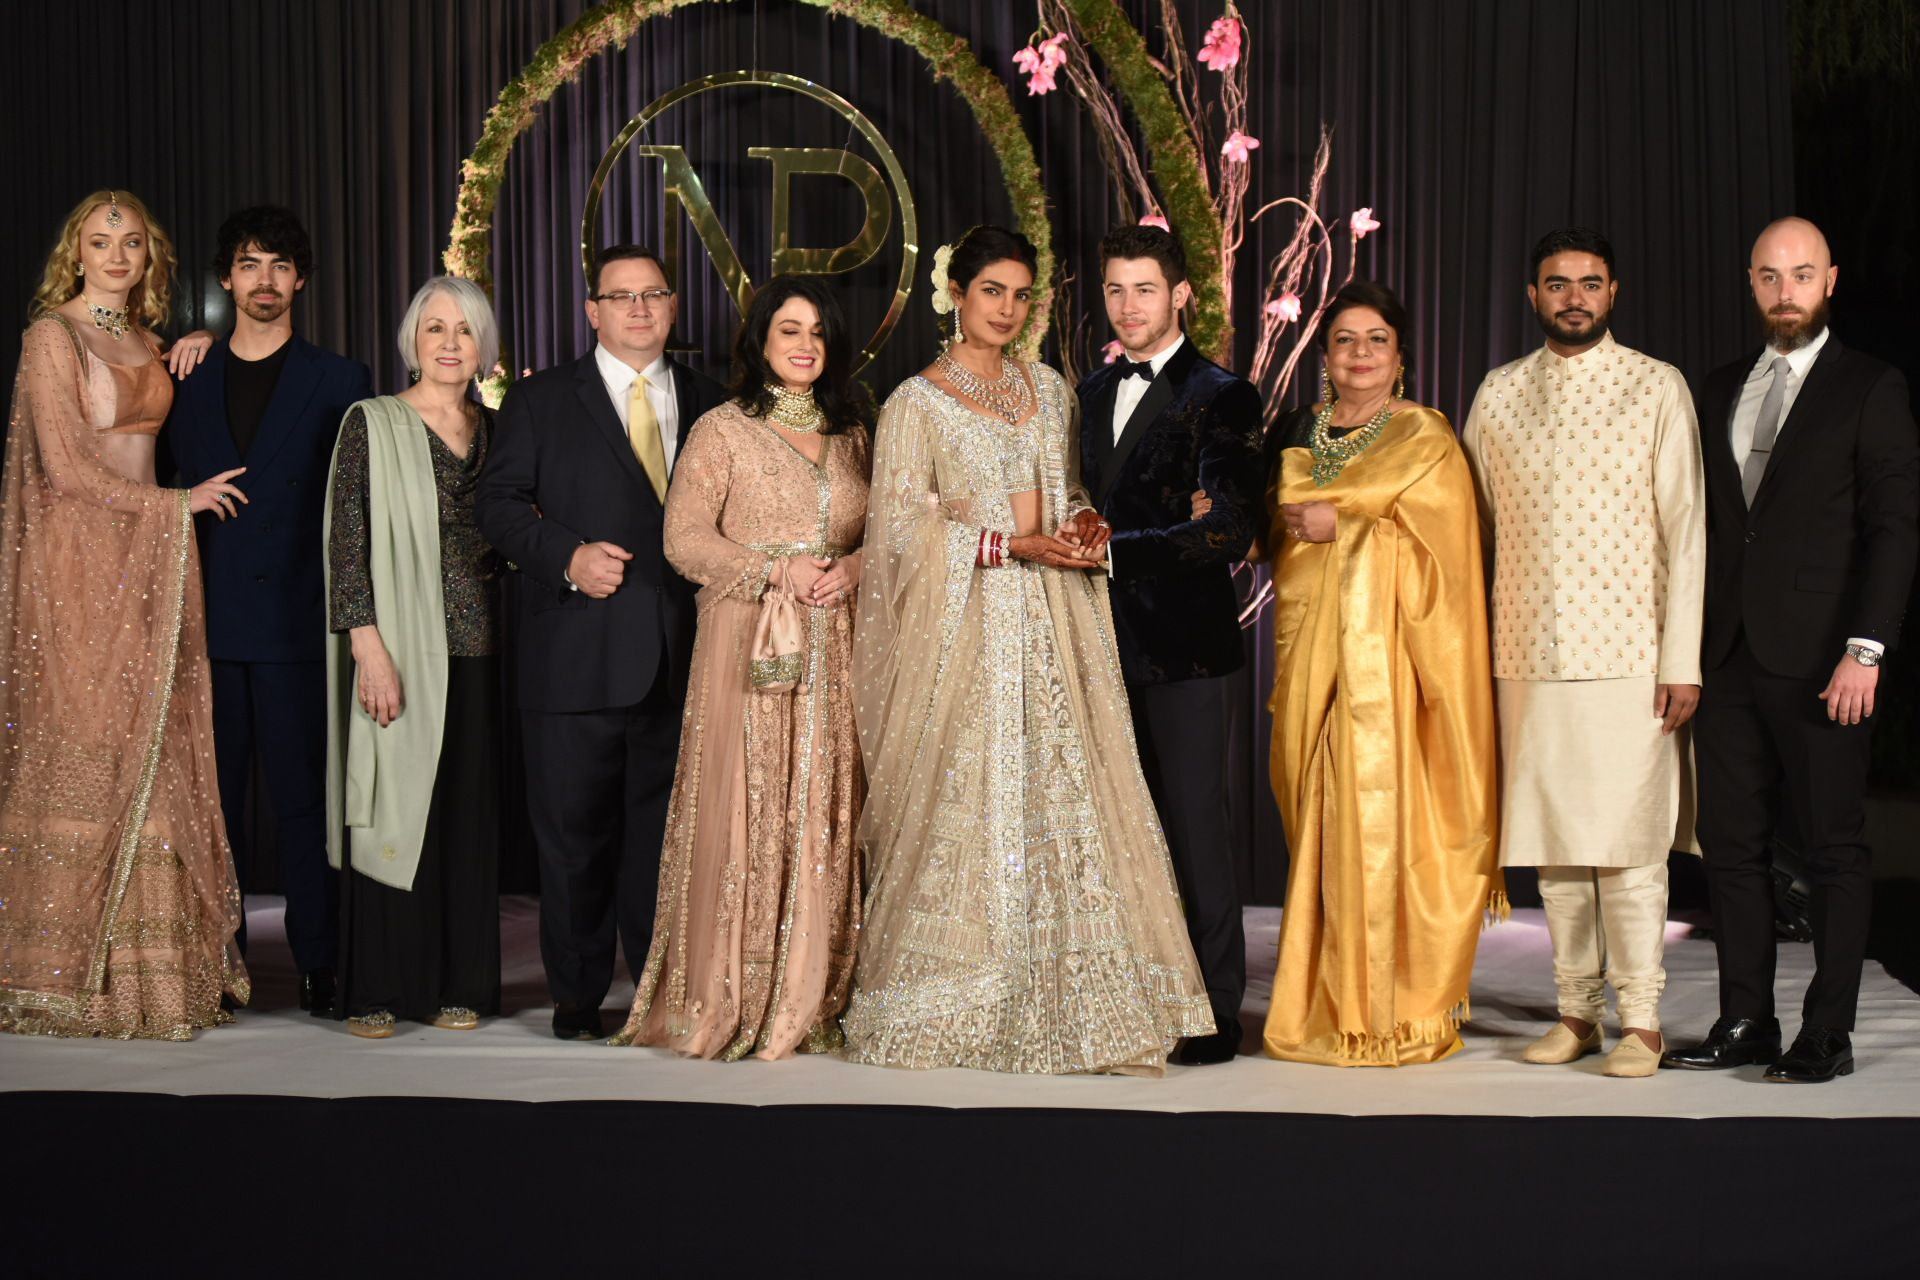 Priyanka Chopra Shares Her and Nick Jonas's Family Wedding Portraits